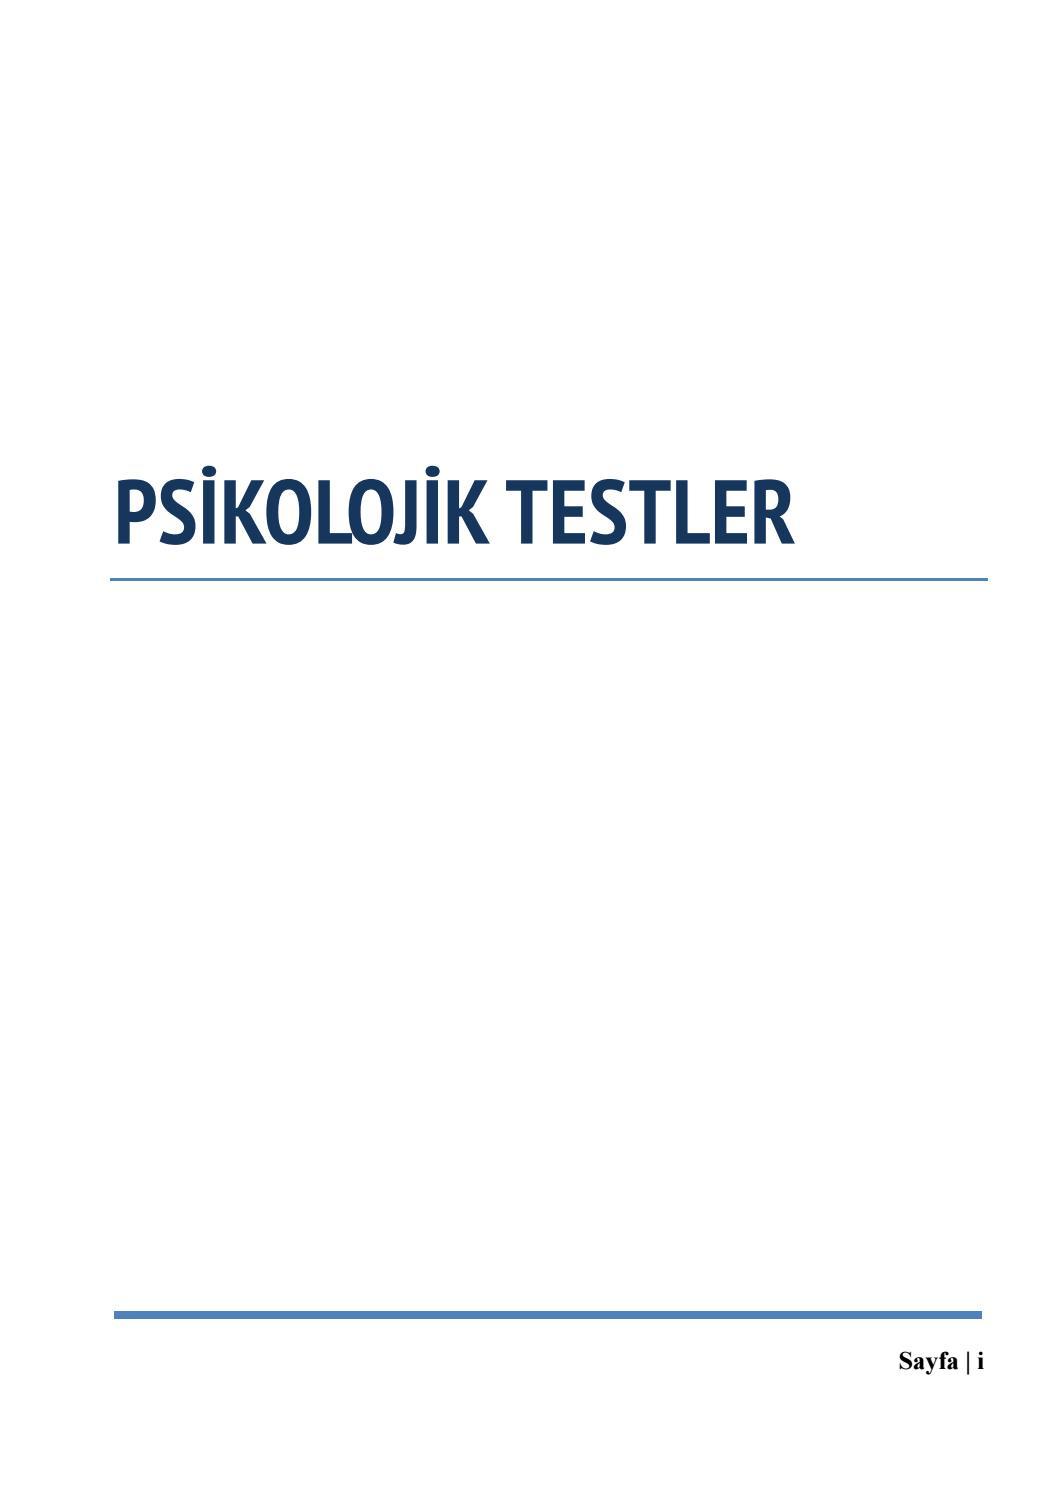 Psikolojik Testler By Prof Dr Bilal Semih Bozdemir Issuu